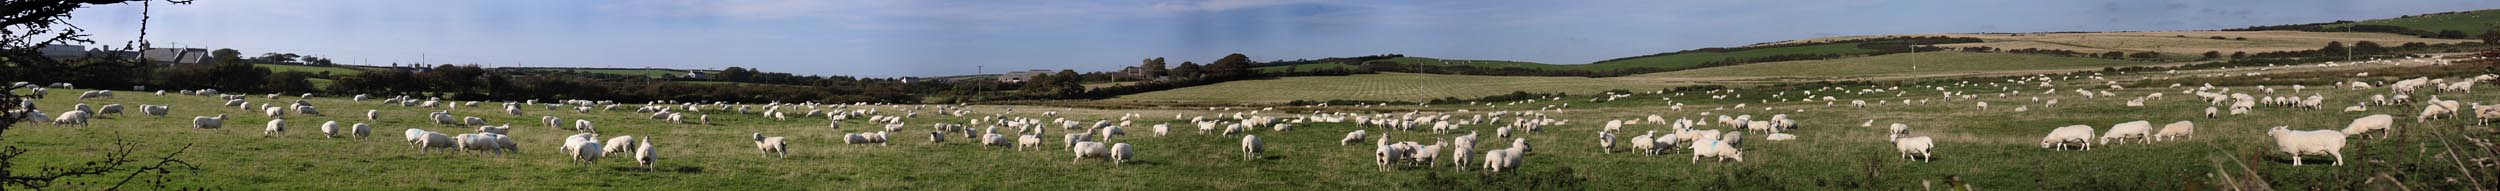 Sheep,panorama,Wales,farm,field,Anglesey,UK,mint,source,sauce,hotpix,tonysmith,tony,smith,hotpixuk,TDKTony,TDK,365days,Panoramique,int\u00e9ressant,join,joiner,stitch,stitcher,autostitch,auto,pano,imagen,panor\u00e1mica,image,panoramisches,Bild,hotpicks,hotpics,hot,pix,pics,stitched,joined,images,widescreen,wide,\u043f\u0430\u043d\u043e\u0440\u0430\u043c\u0430,\u30d1\u30ce\u30e9\u30de,\u5168\u666f,\ud55c\uad6d\uc5b4